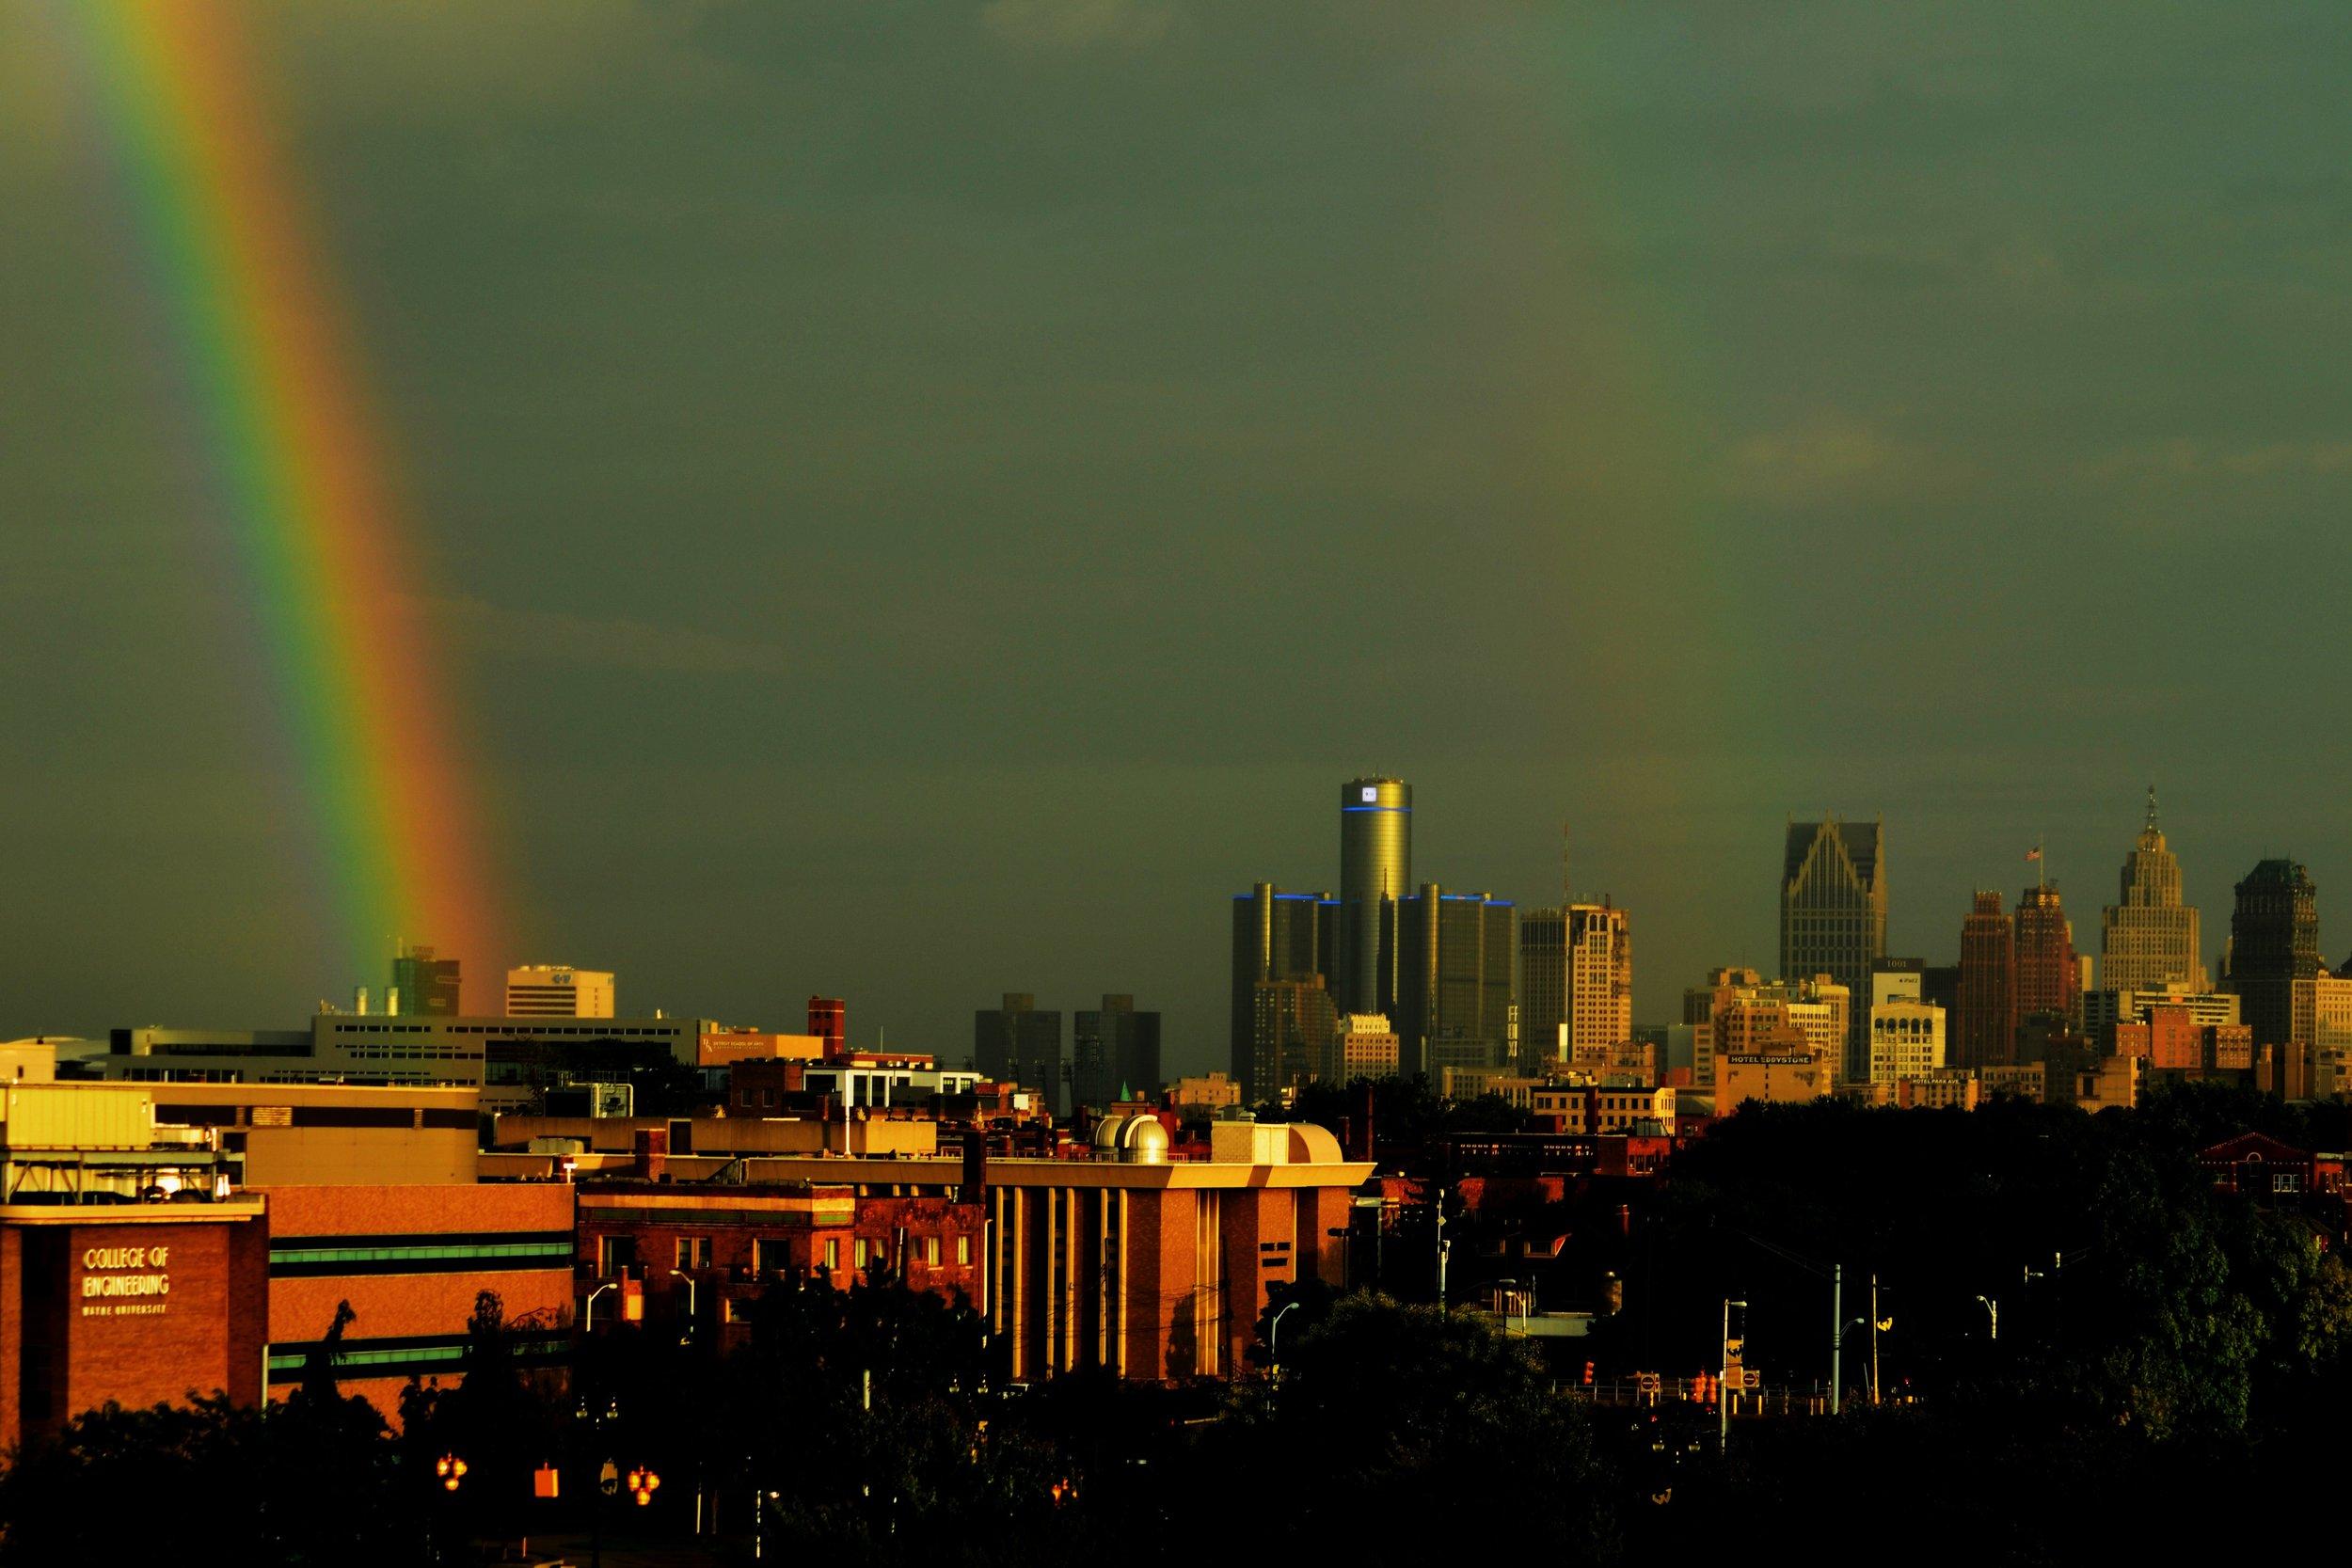 Sept. 11, 2011